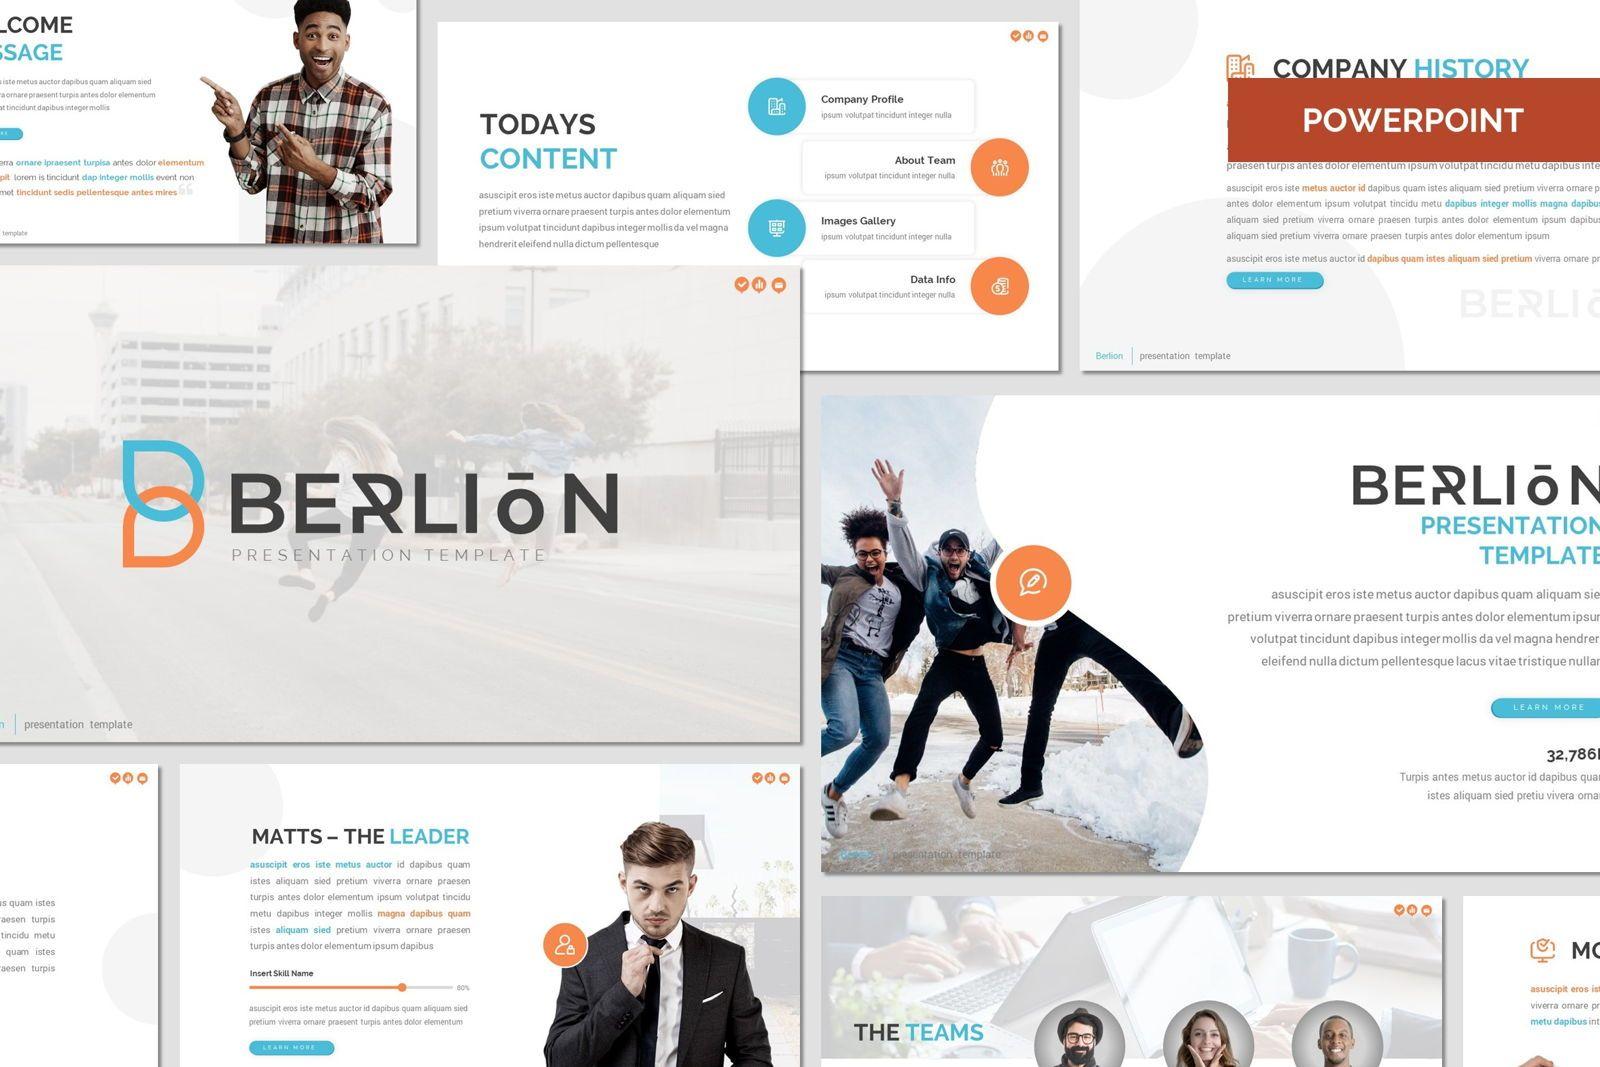 Berlion - Powerpoint Template, 08049, Presentation Templates — PoweredTemplate.com